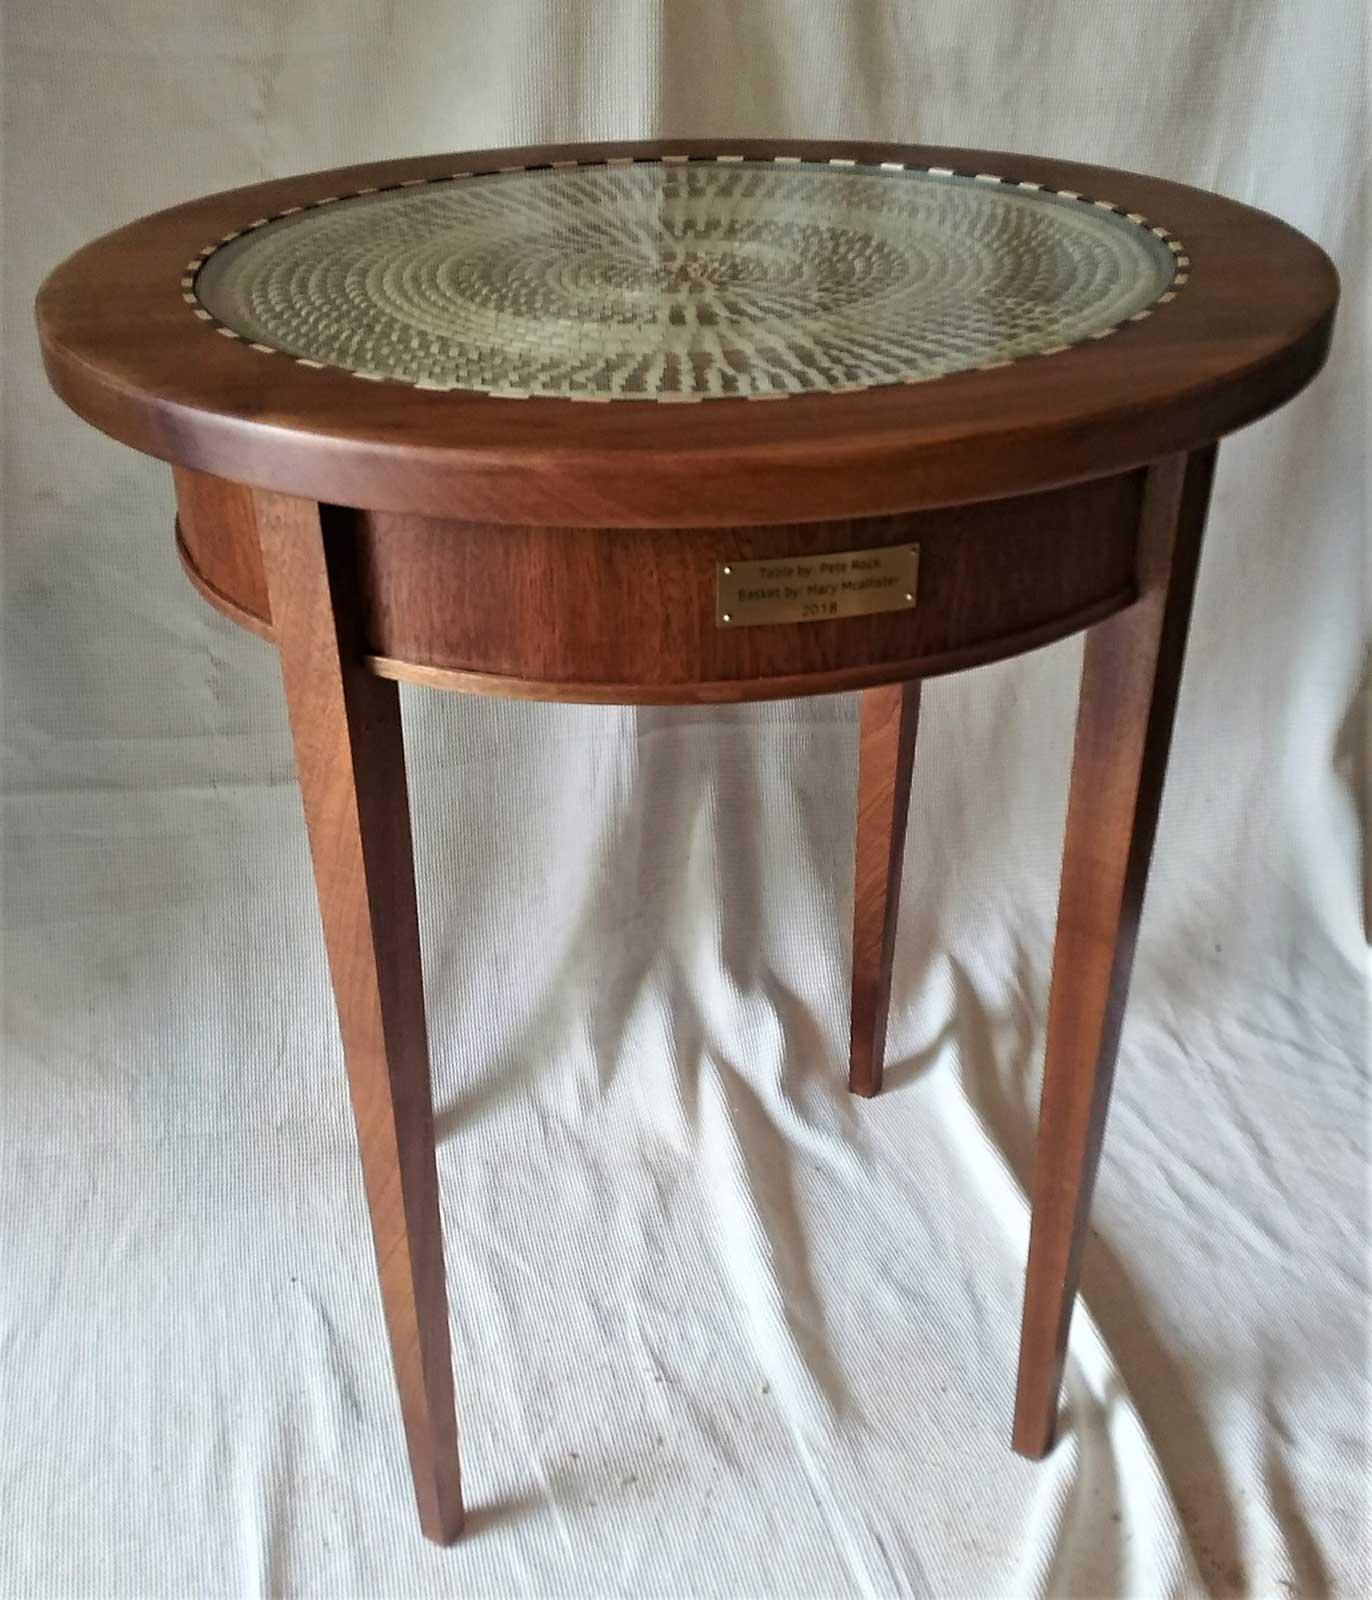 Pete Rpck Sweet Grass Table #28 $1,000